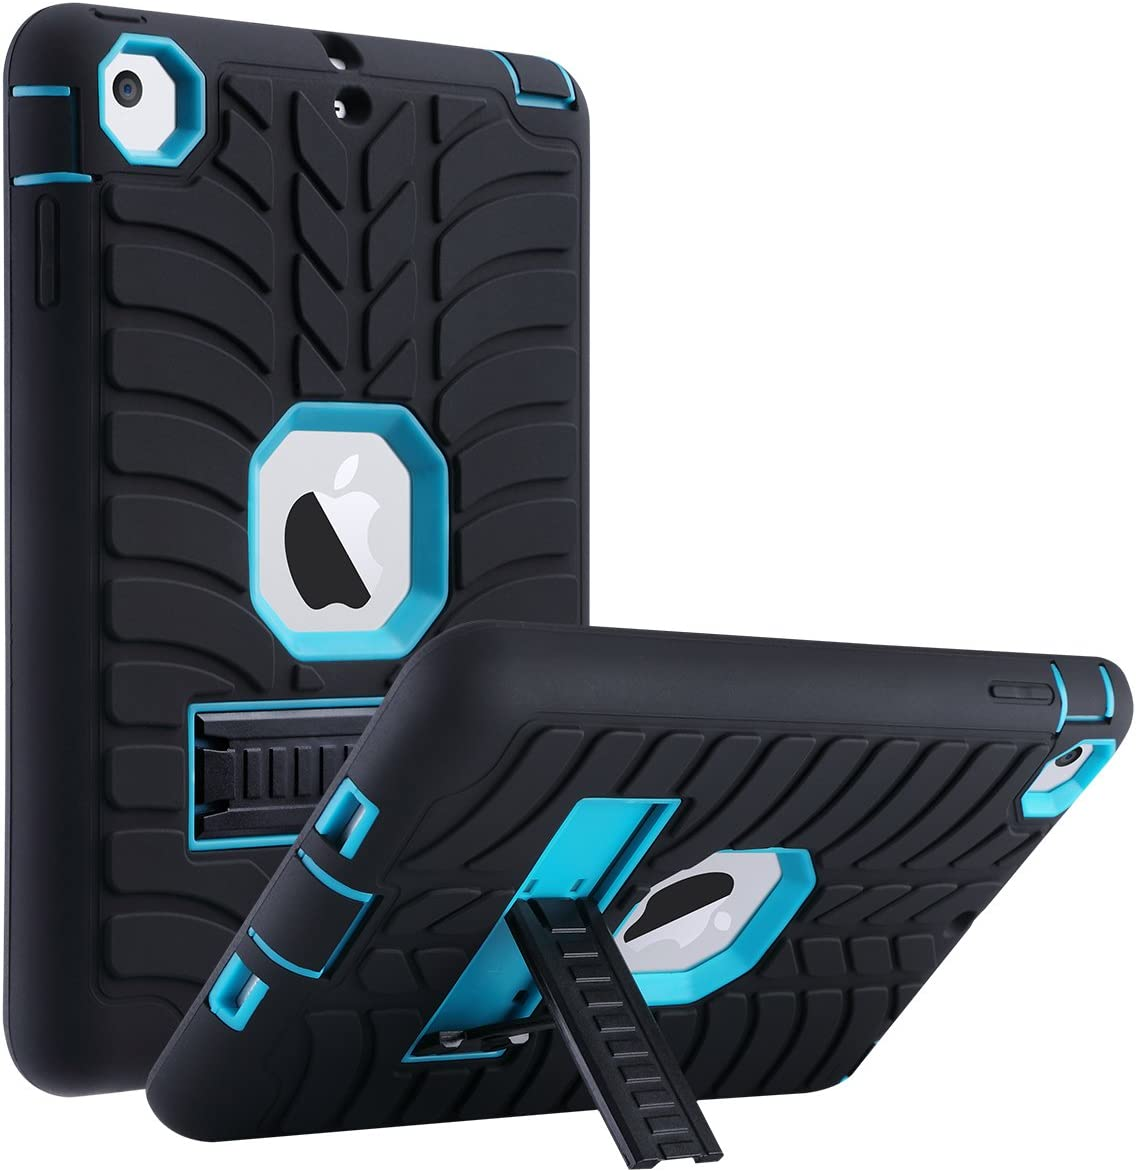 ULAK iPad Mini 2 Case, iPad Mini Case, iPad Mini 3 Case, iPad Case with Stand Shock-Absorption Three Layer Protective Case for Apple iPad Mini, Mini 2, Mini 3, Mini Retina-Aqua Blue/Black